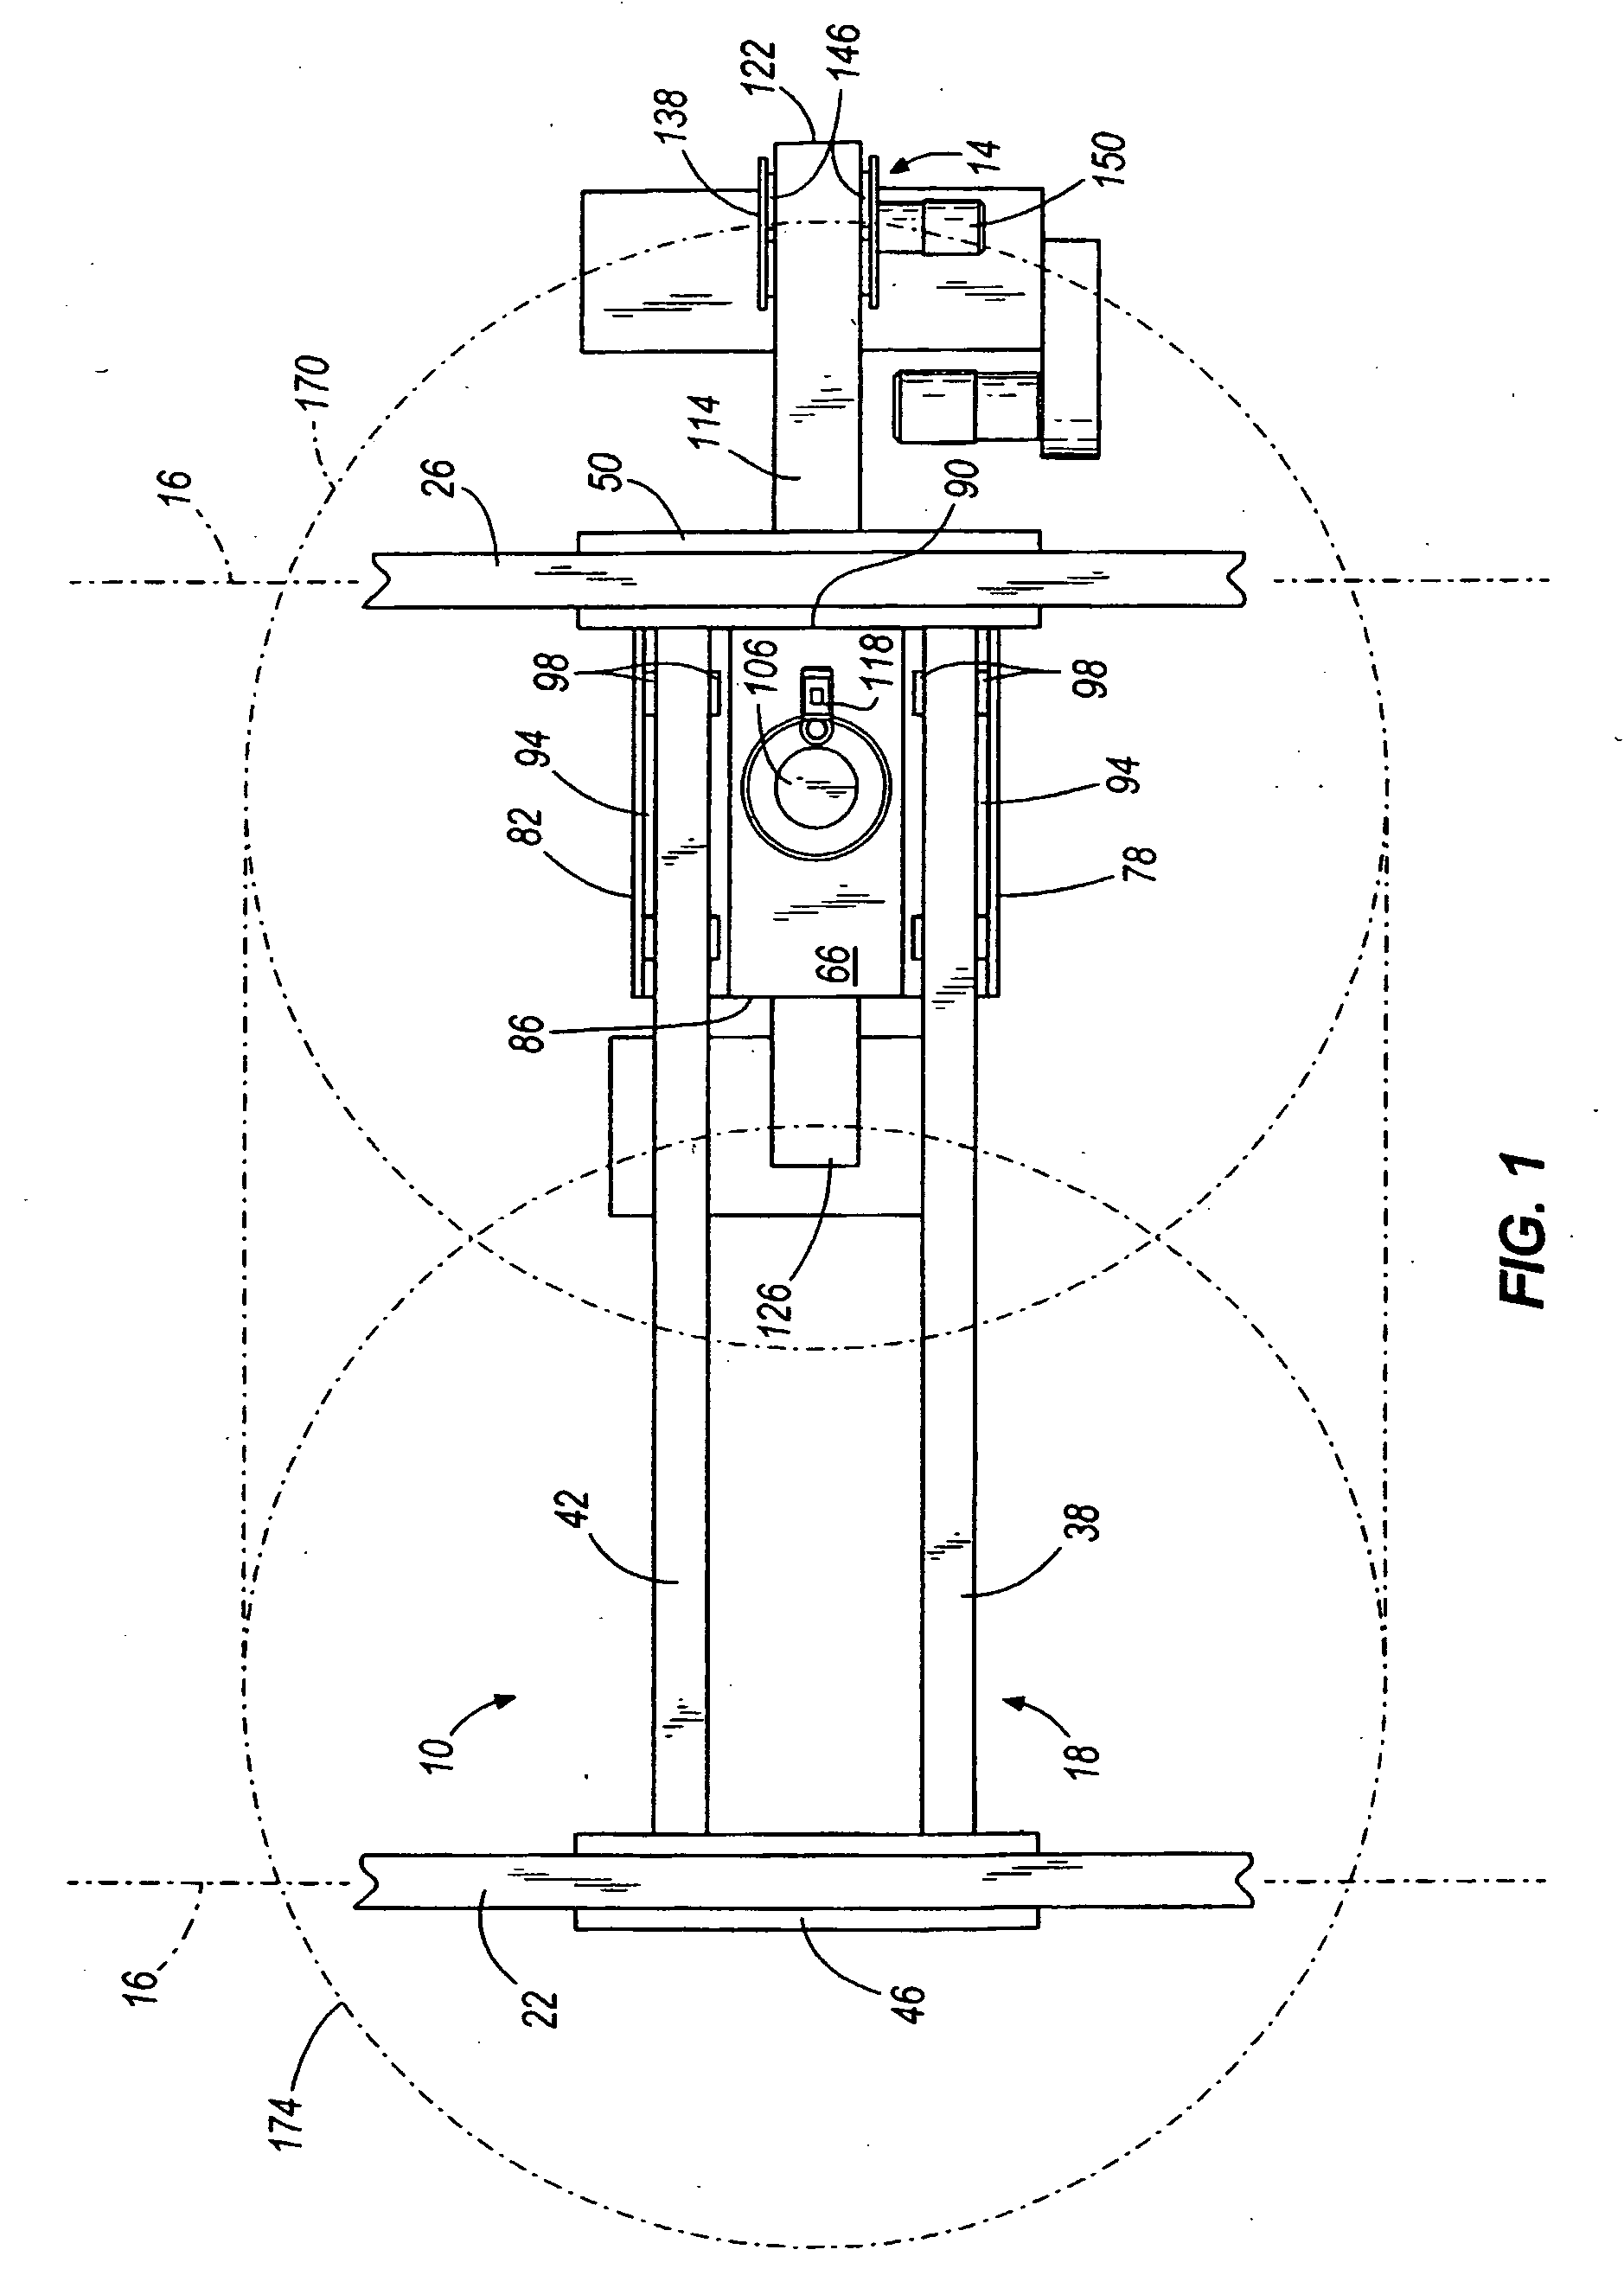 Overhead Jib Crane | Wiring Diagram Database